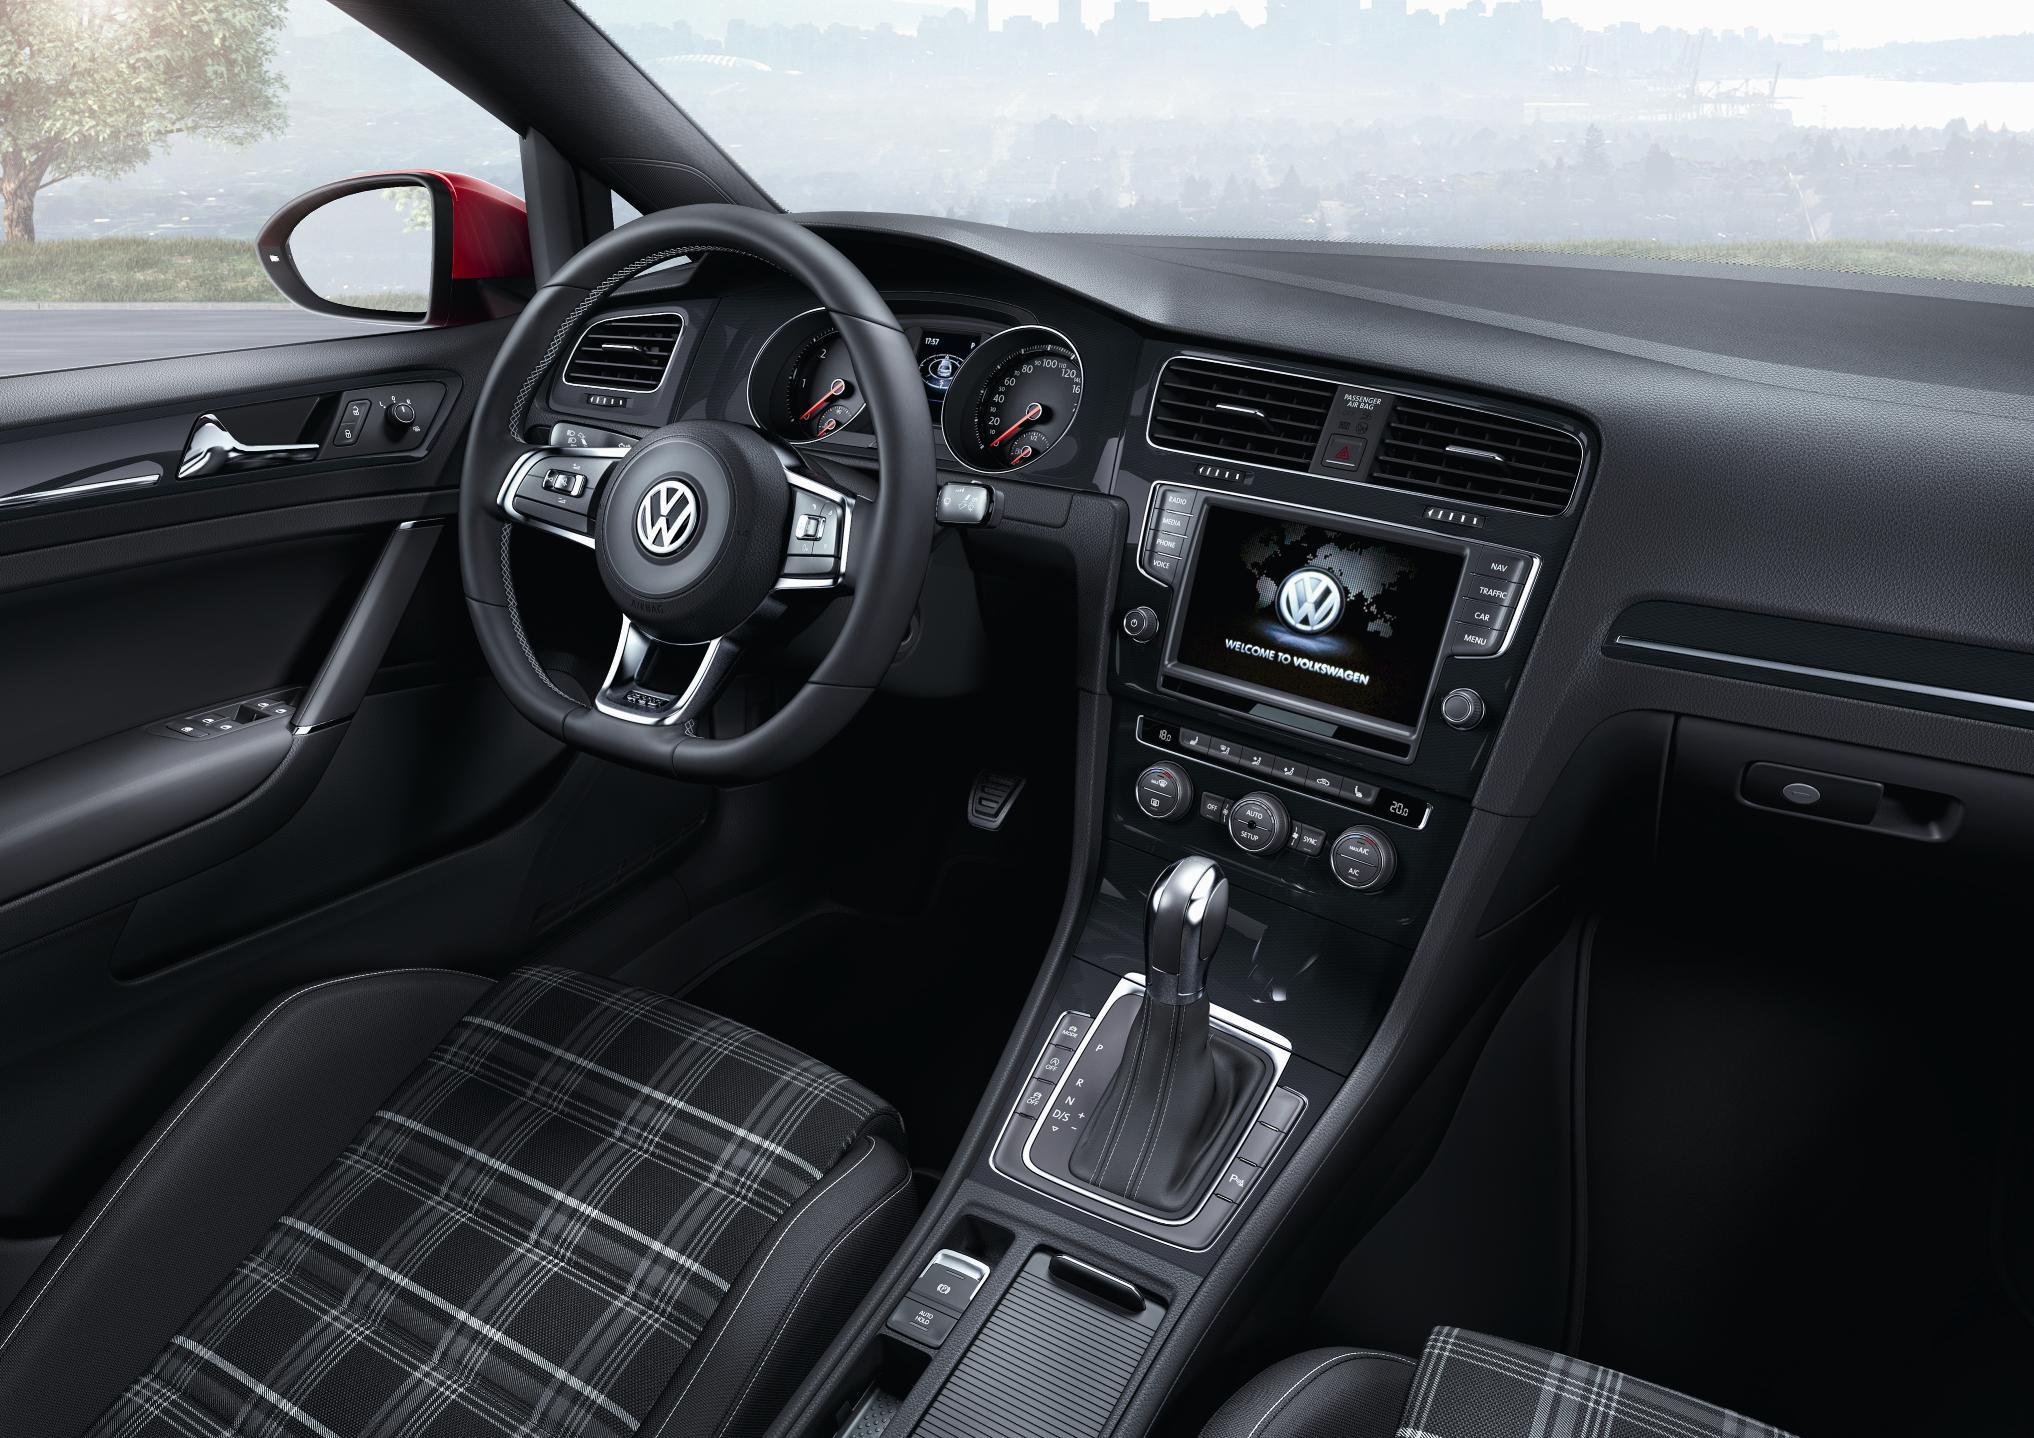 VW Golf GTD 2013 Interior